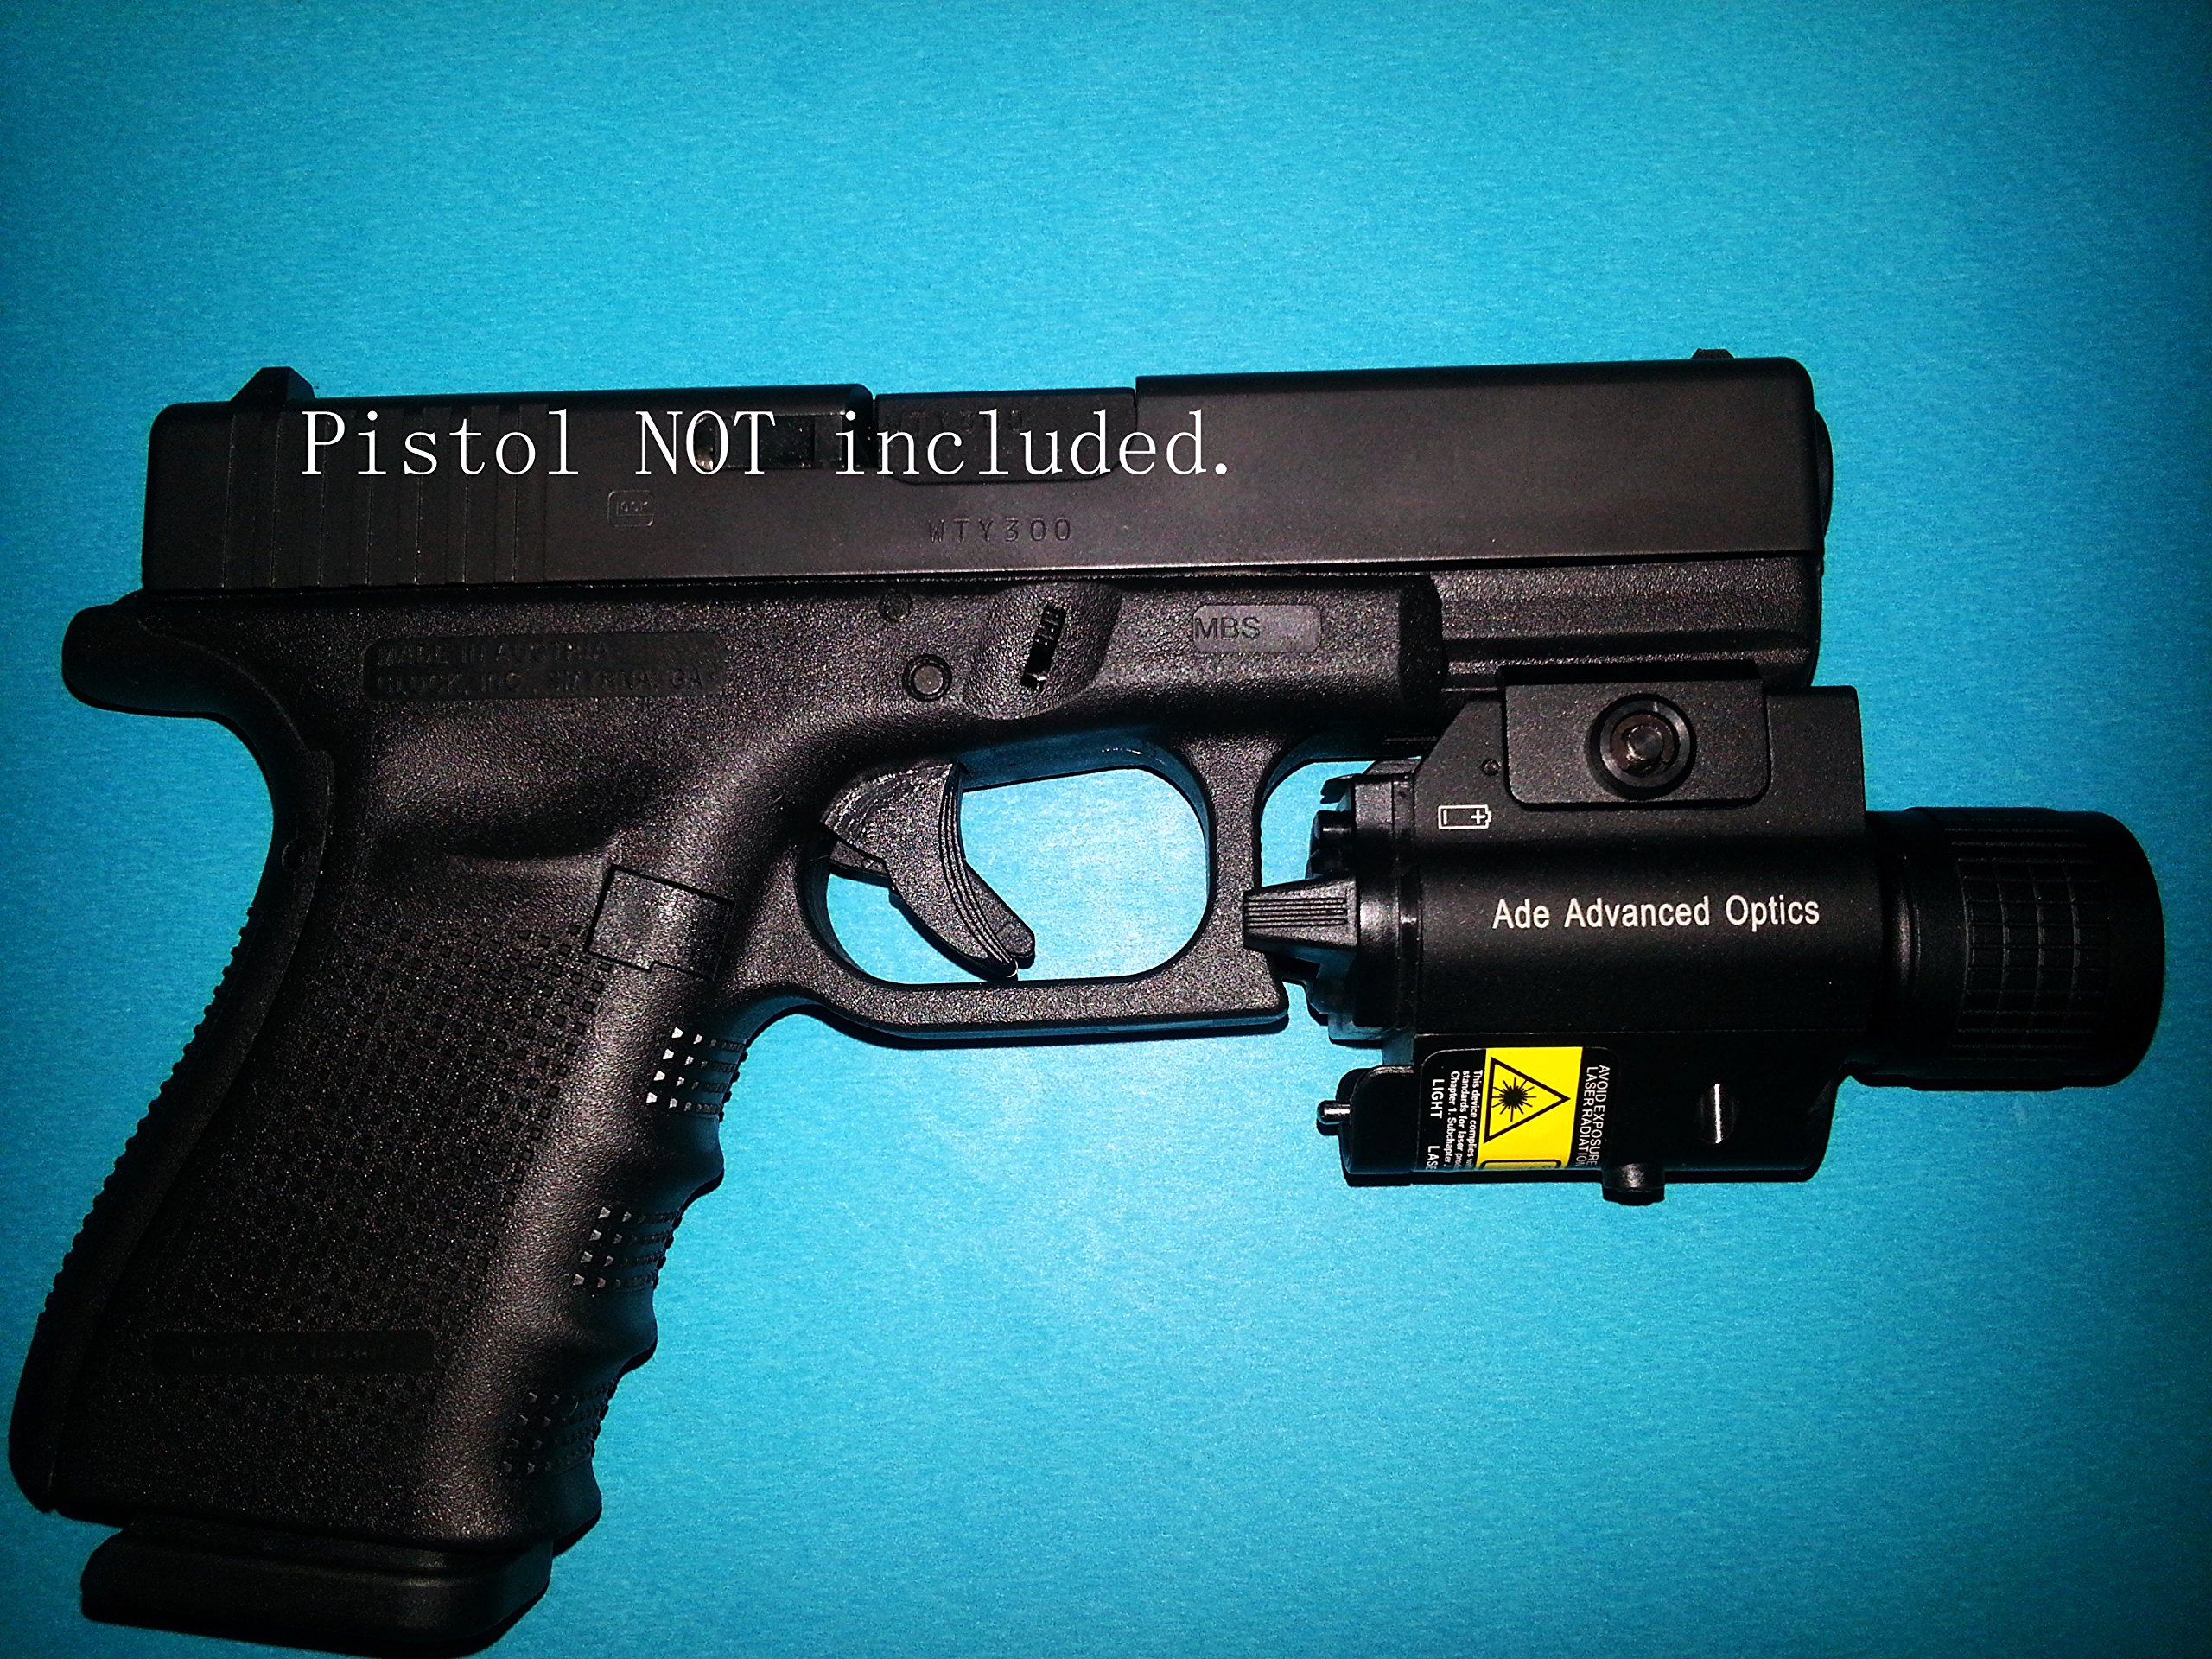 Ade Advanced Optics LS003G Non-Handheld Class 3R Green Laser Flashlight Sight for Pistol Handgun by Ade Advanced Optics